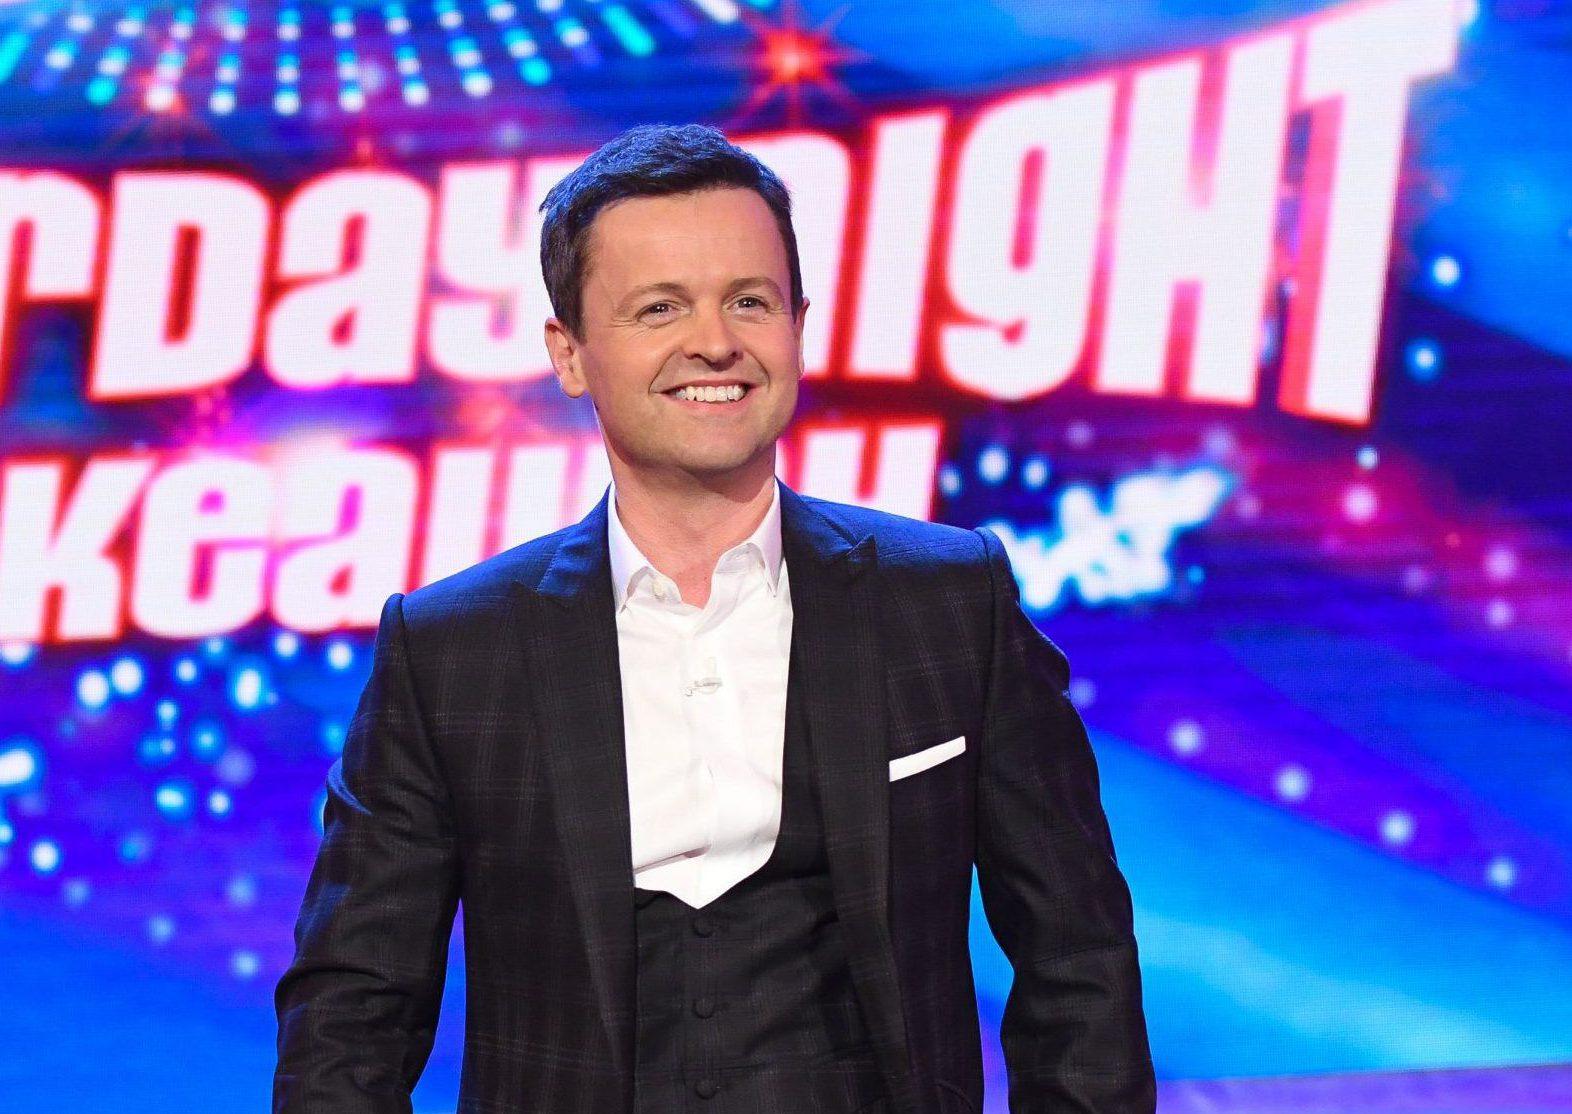 Declan Donnelly 'taking a break' after Saturday Night Takeaway finale ahead of Britain's Got Talent